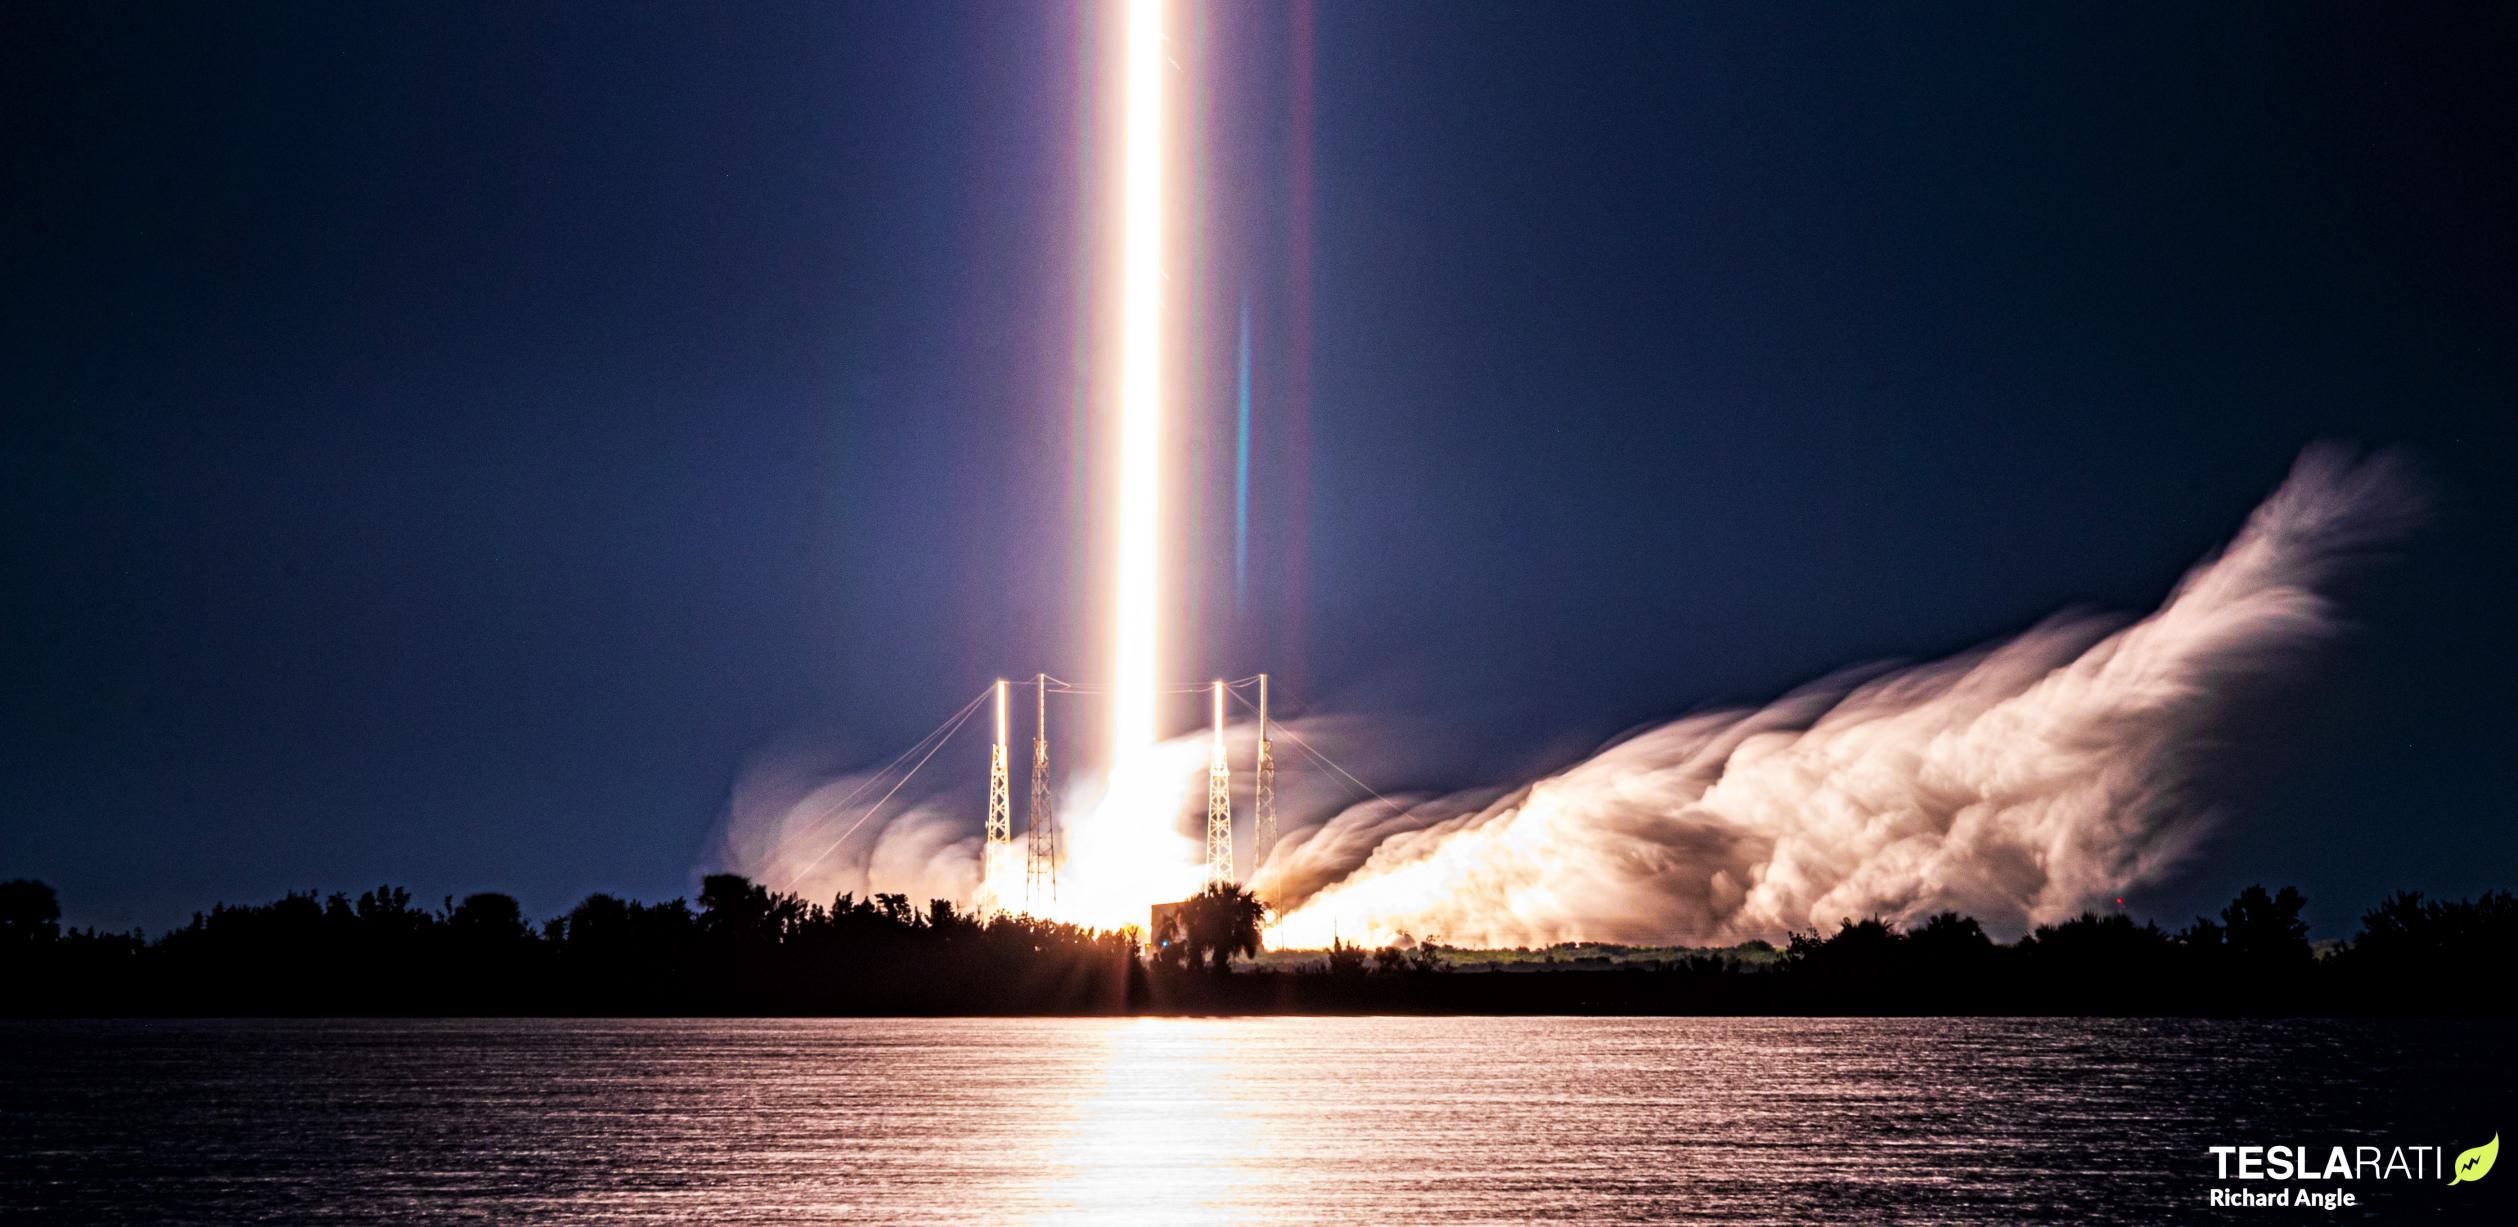 Starlink-18 Falcon 9 B1060 020421 (Richard Angle) launch streak 1 crop (c)